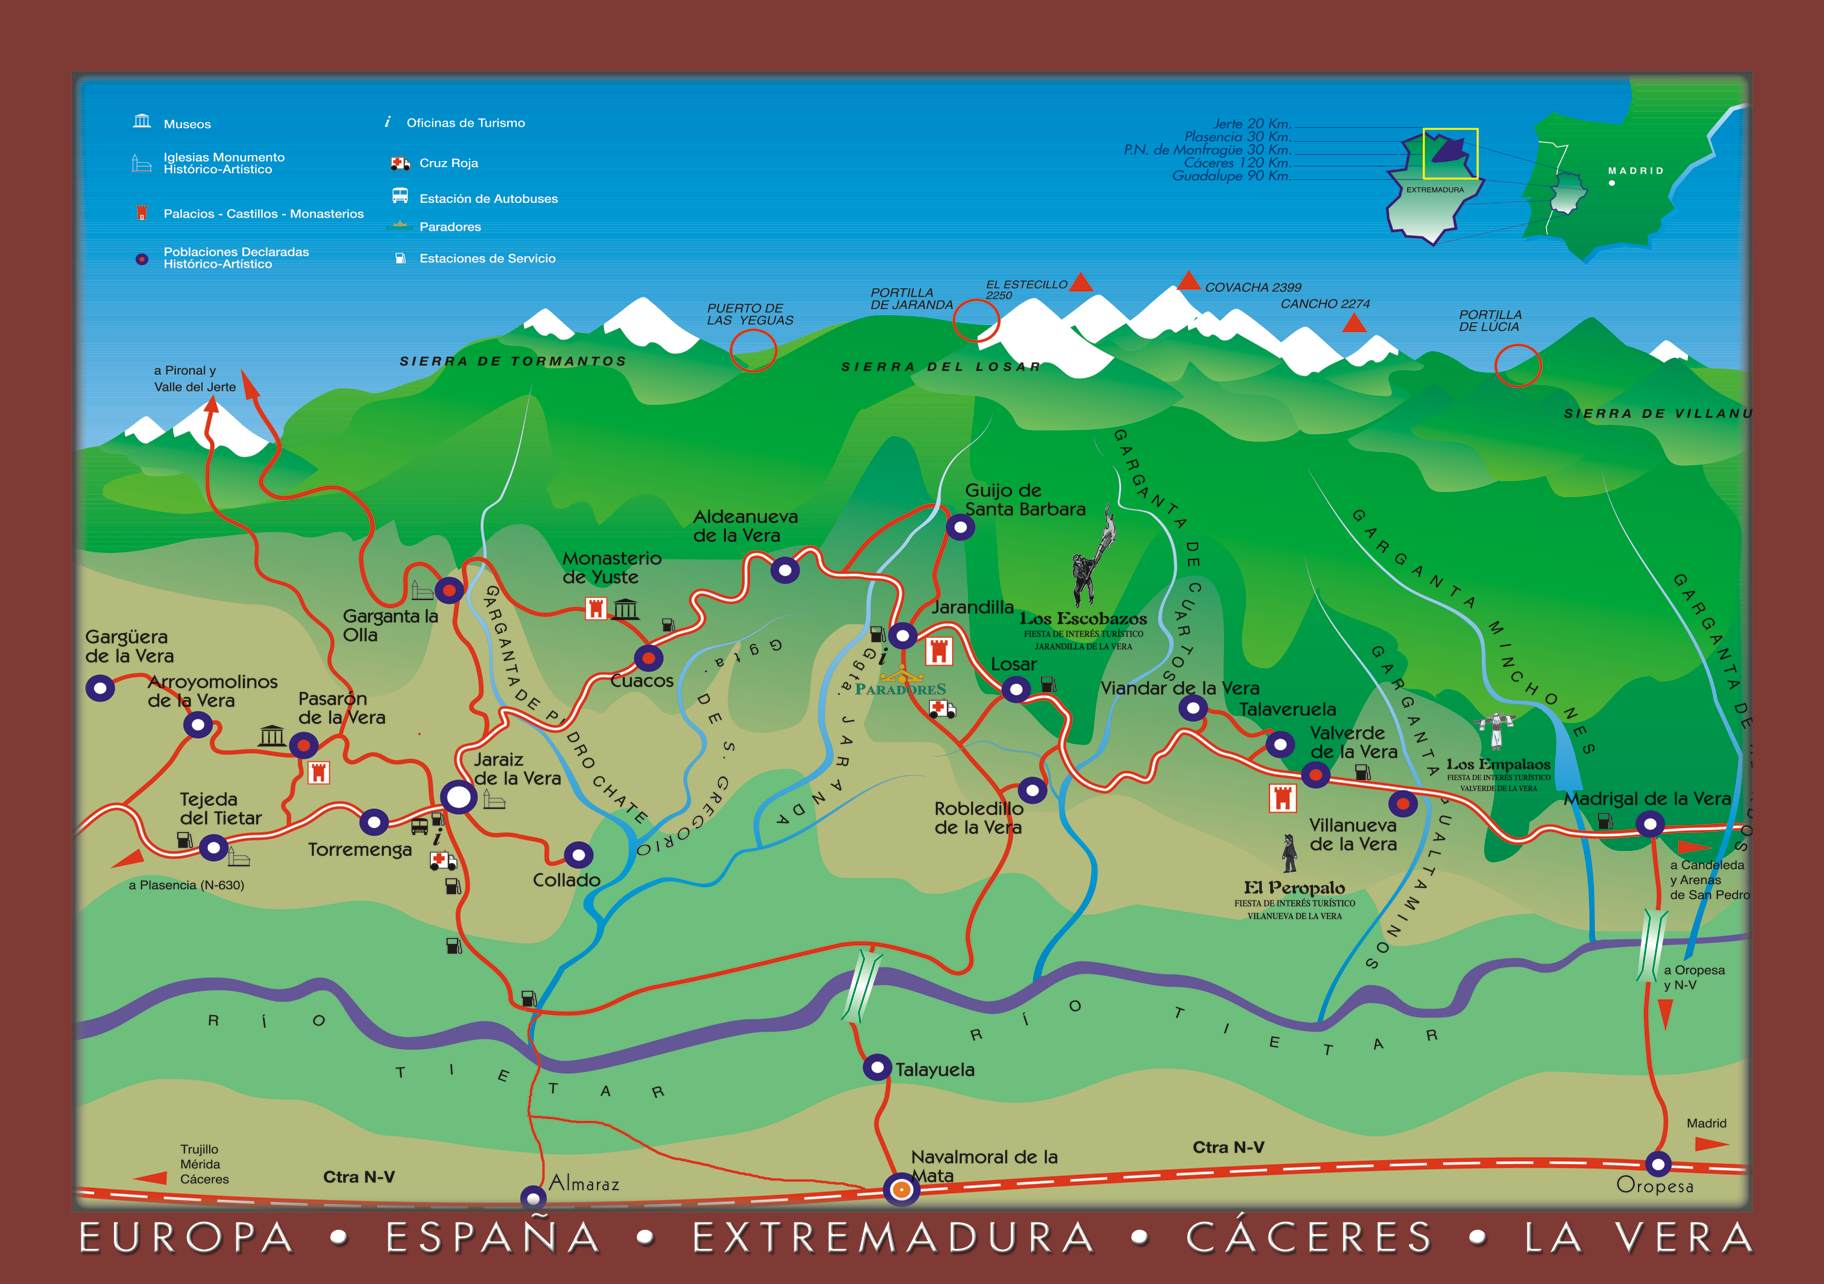 Mapa de la vera caceres my blog for La vera caceres